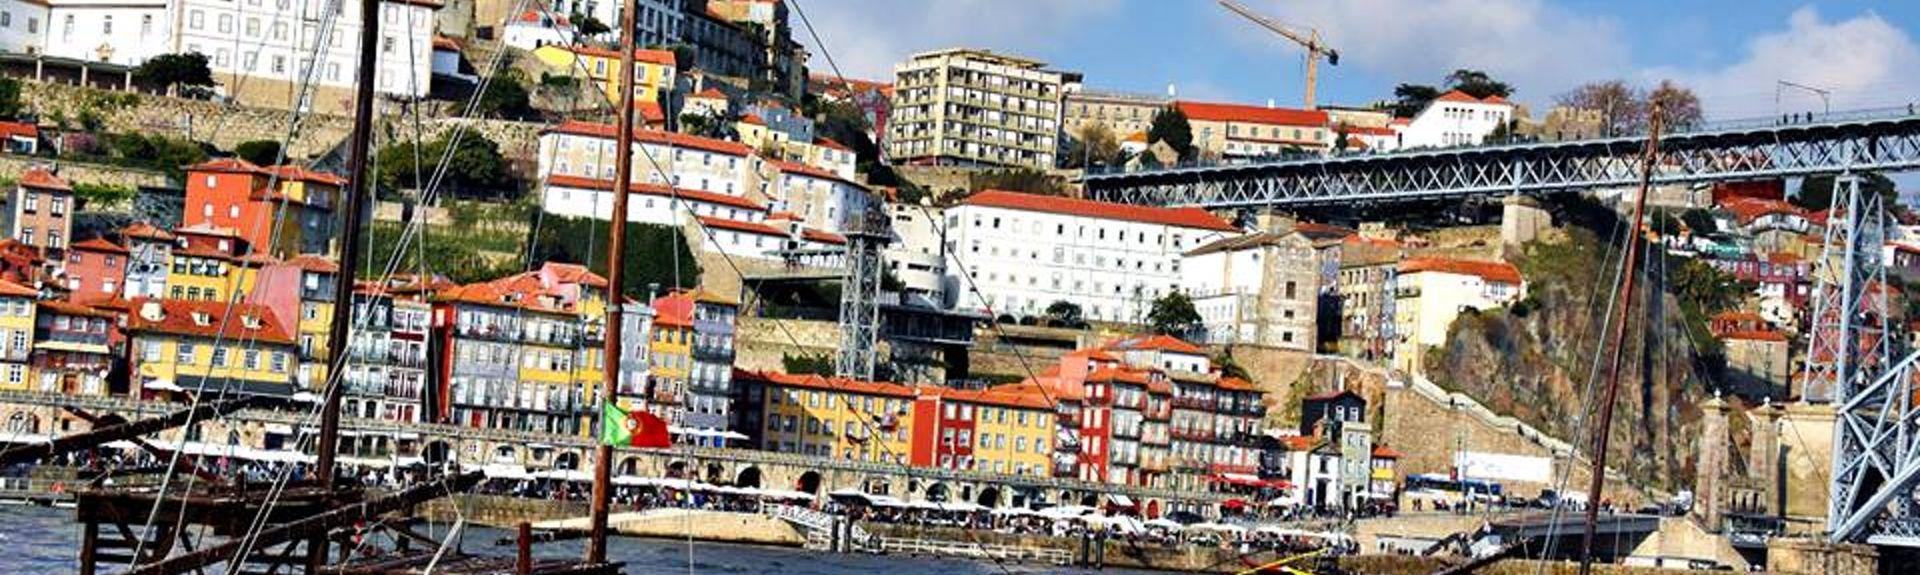 Santa Marinha, Vila Nova de Gaia, Porto District, Portugal